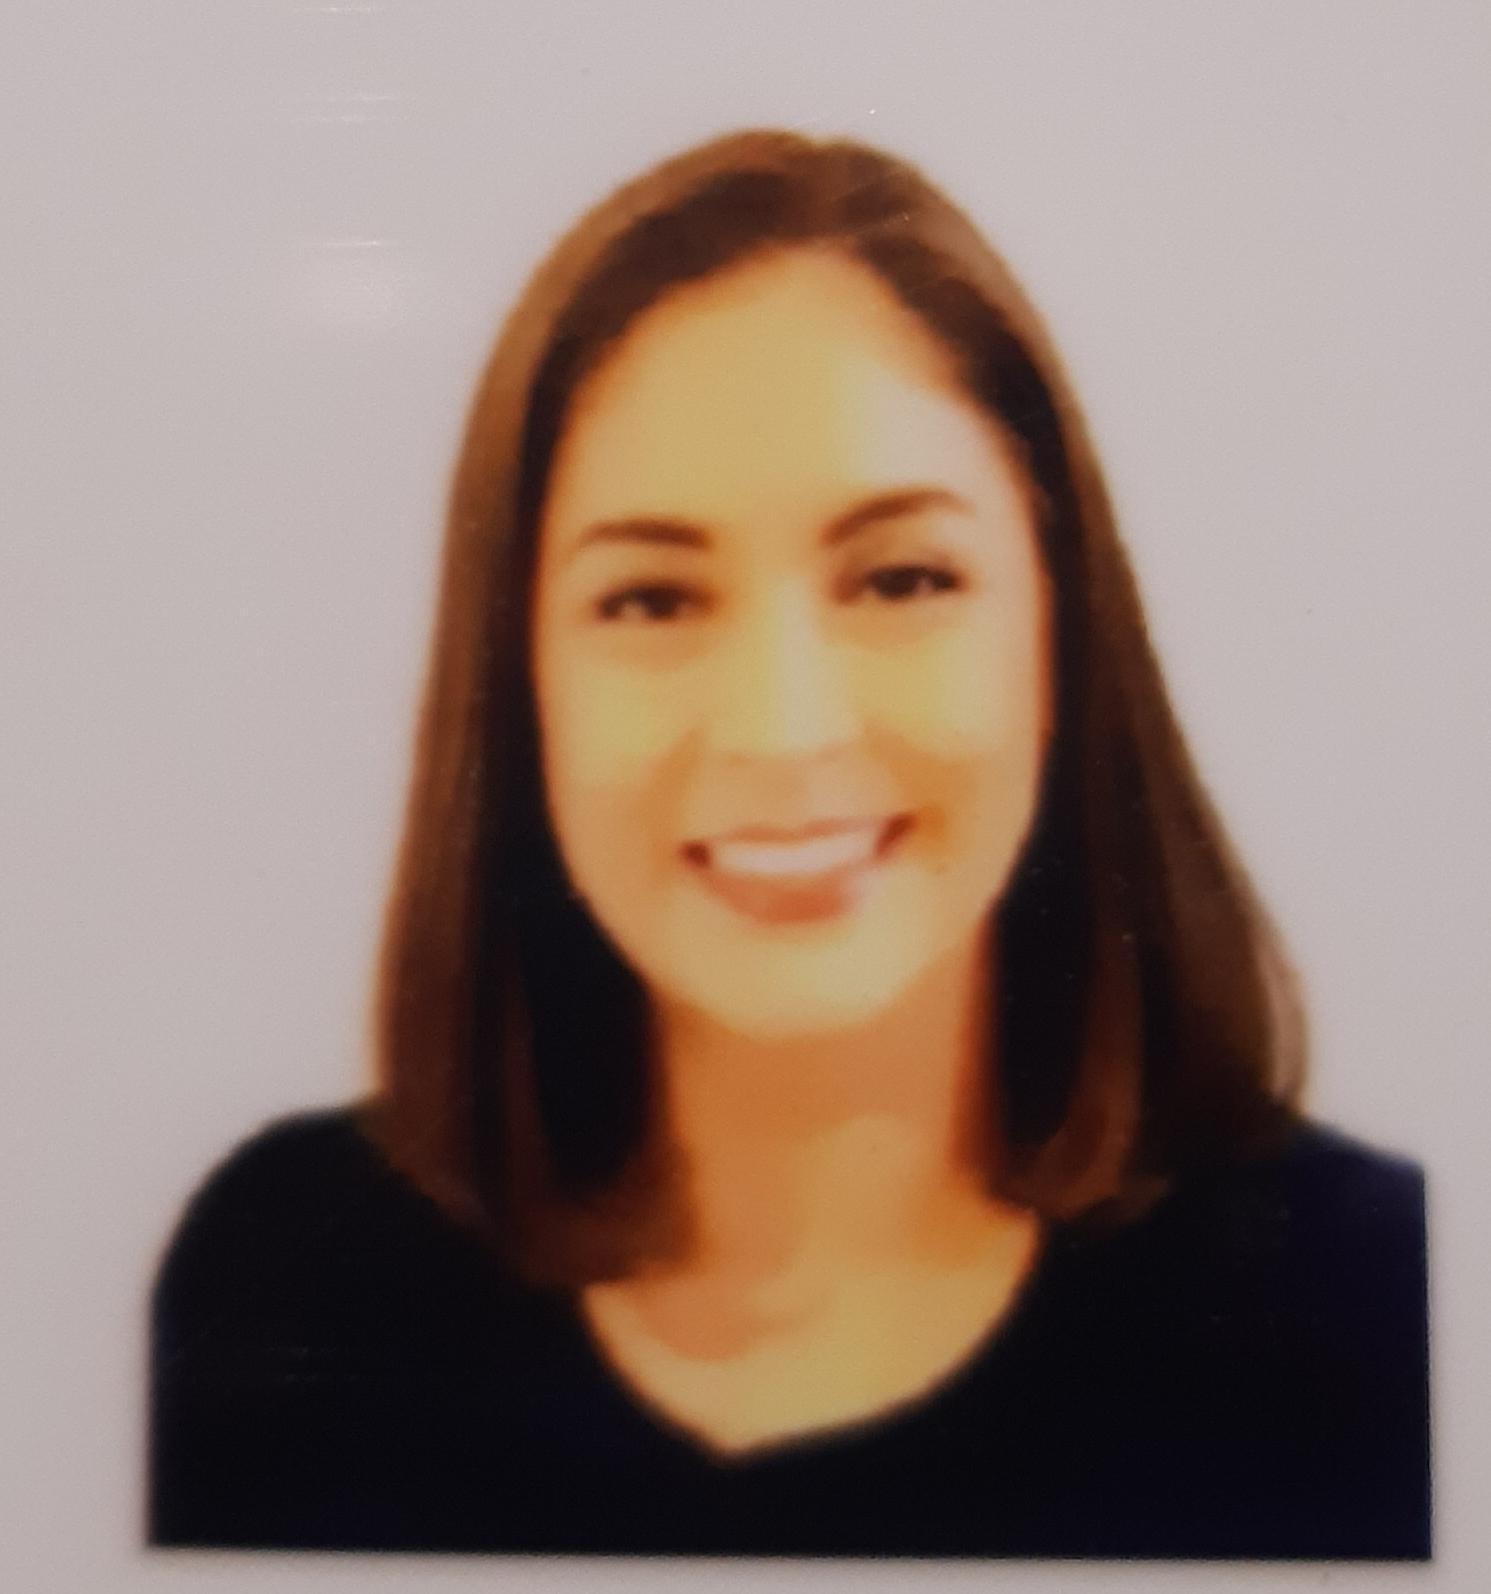 Andrea Espinoza Morales